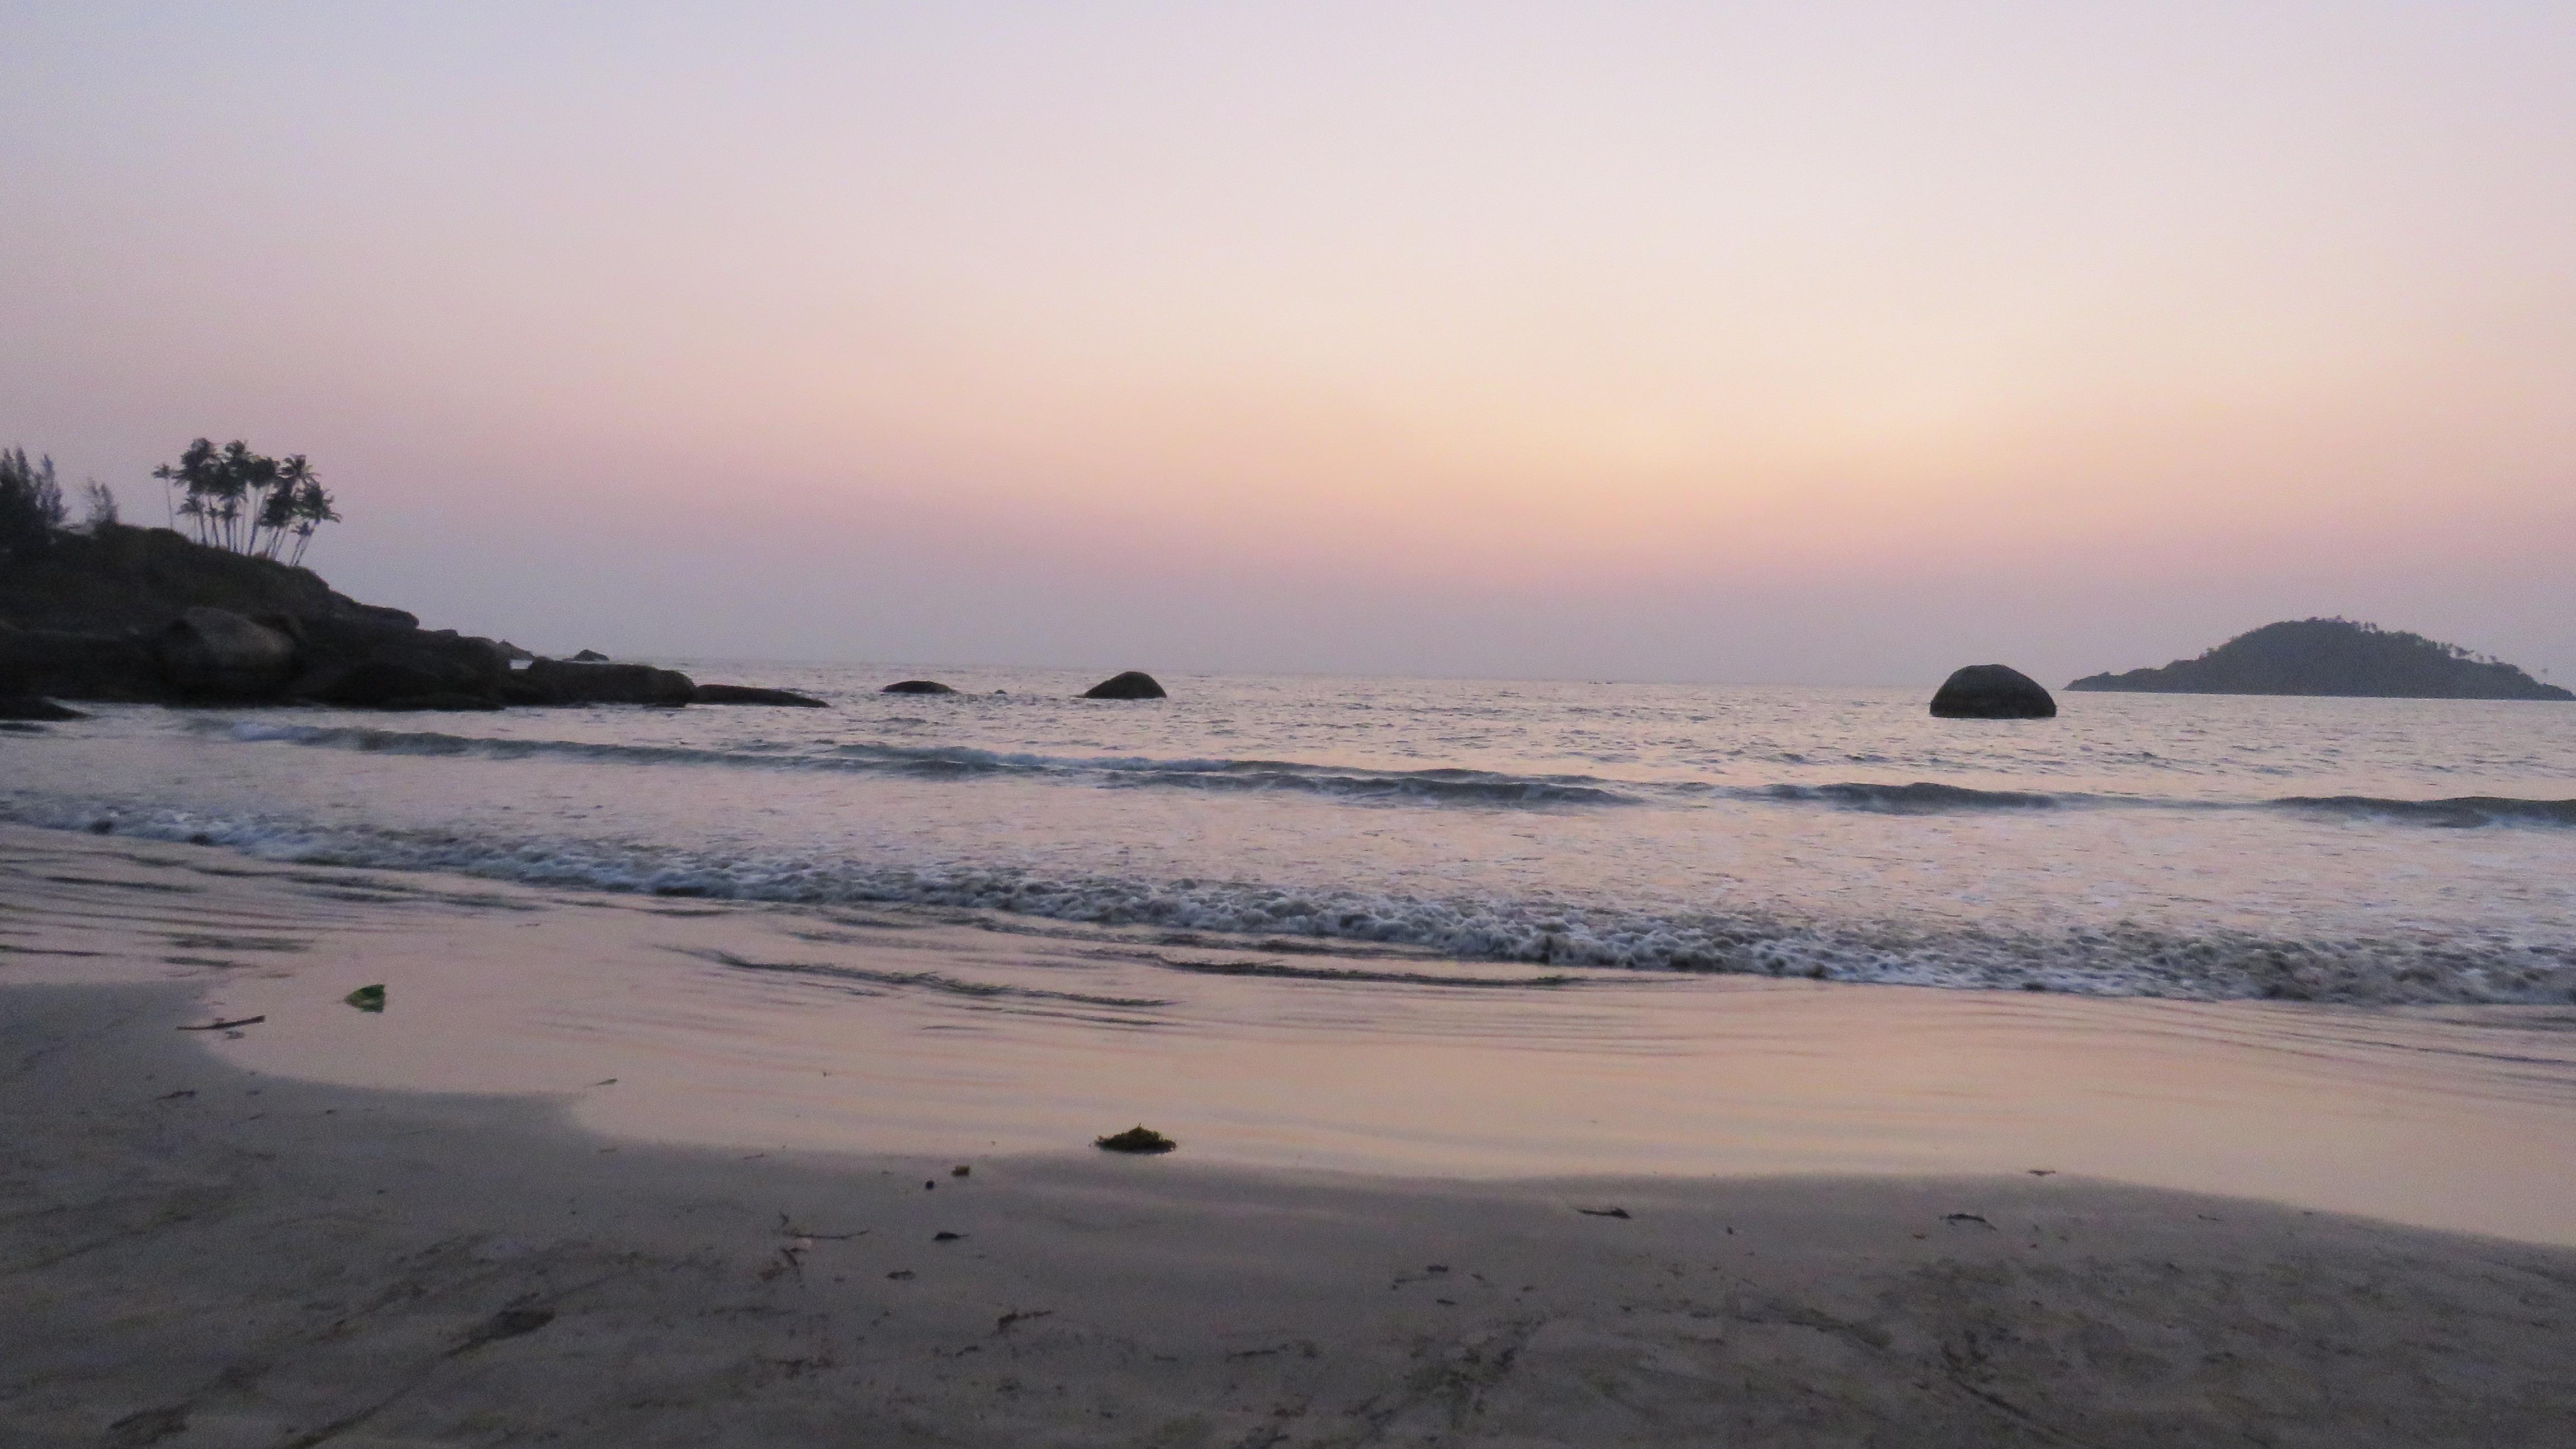 Indian ocean view, Canacona